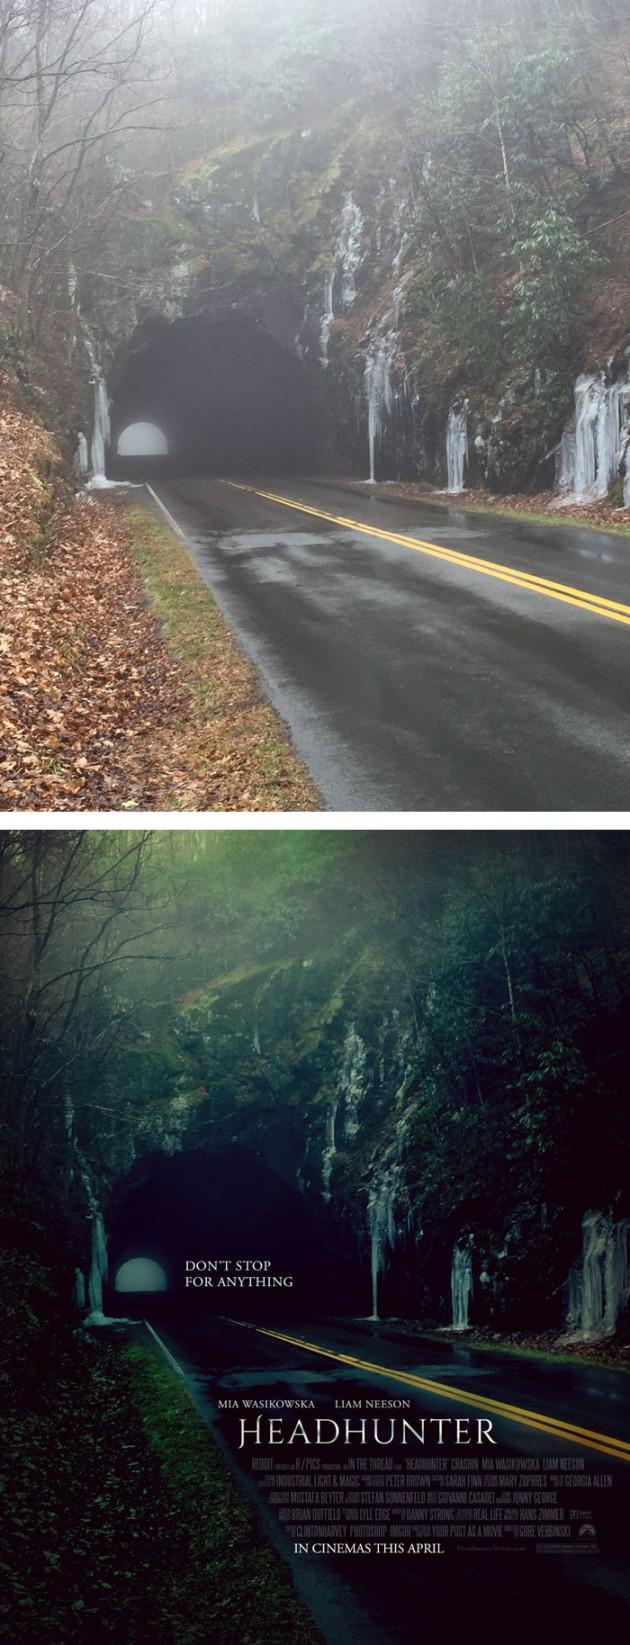 random-photos-turned-into-movie-posters-138__700